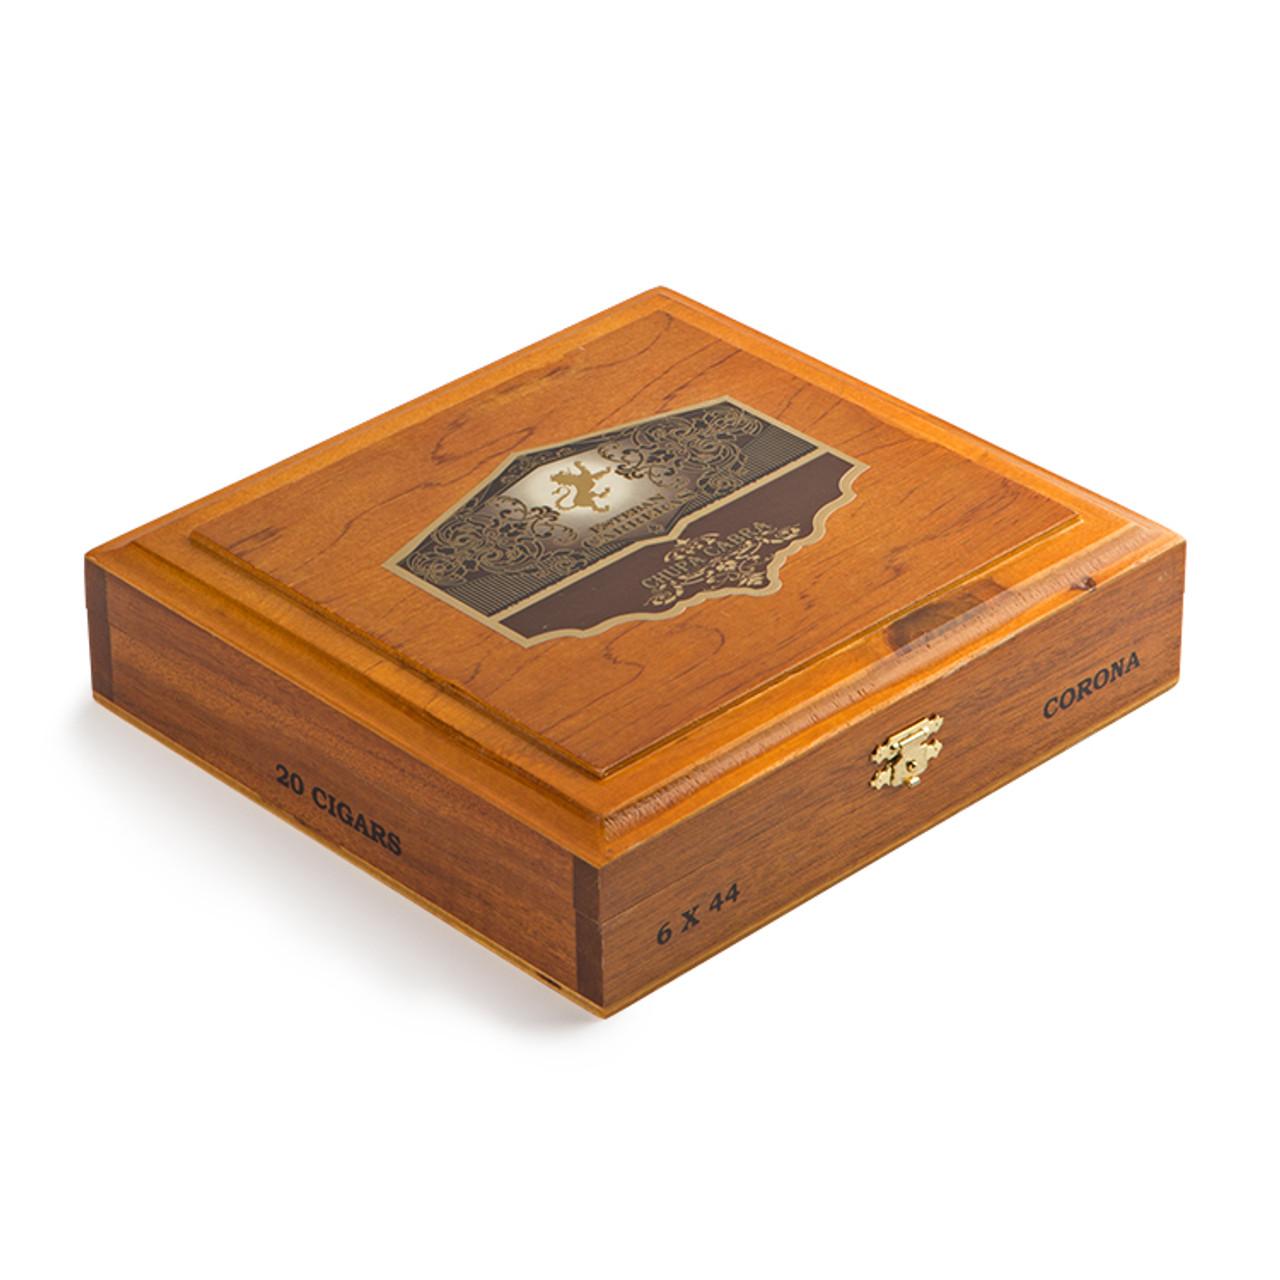 Esteban Carreras Chupacabra Robusto Grande Cigars - 5.5 x 54 (Box of 20)